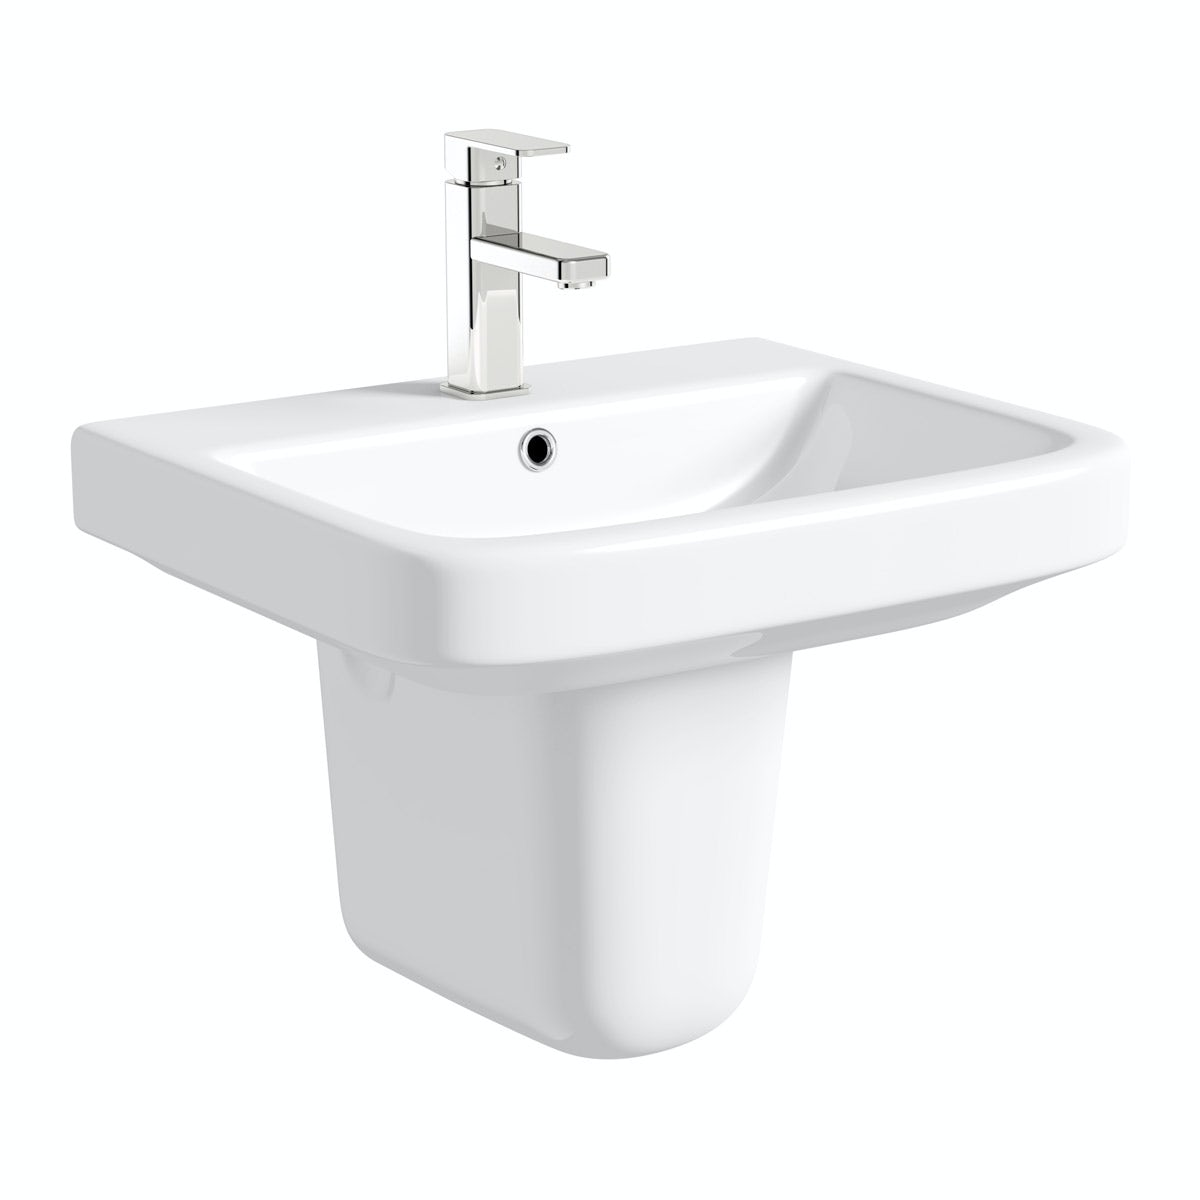 Mode Carter semi pedestal basin 550mm with waste